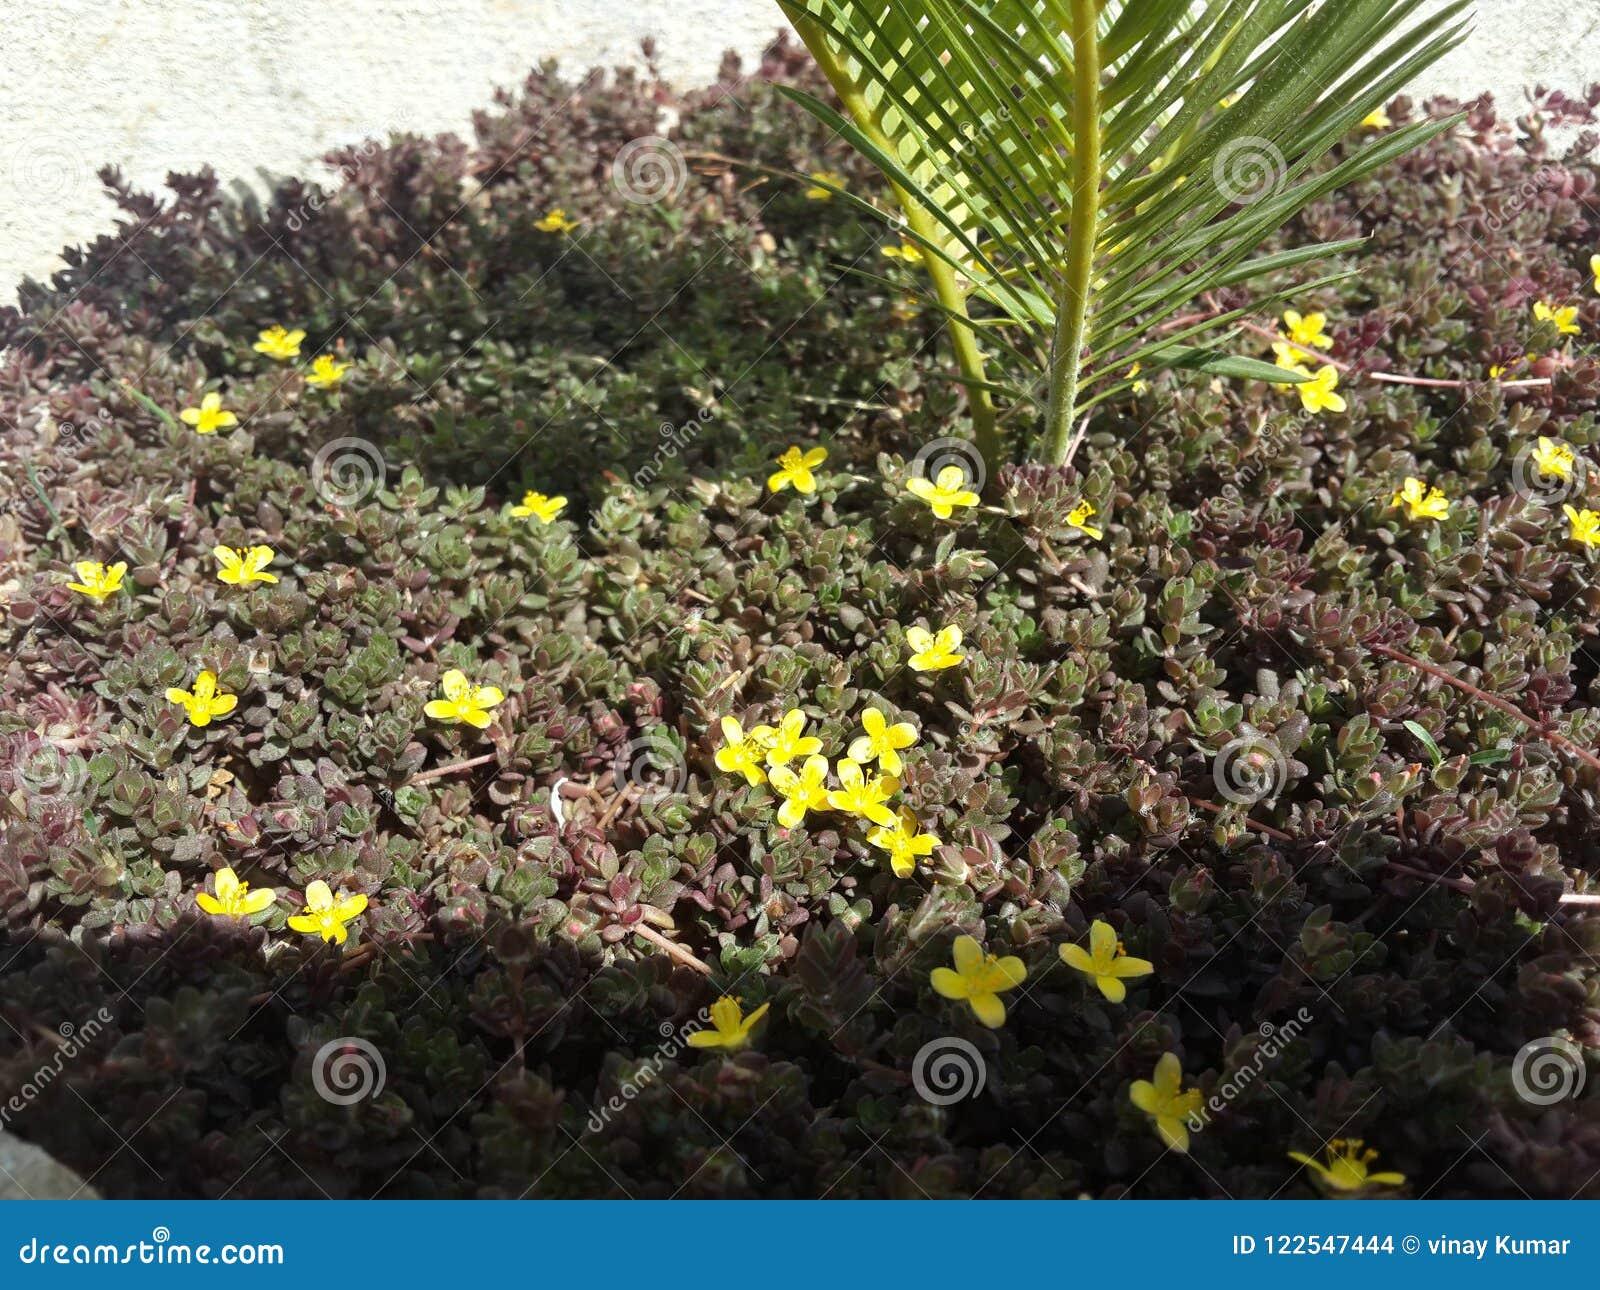 Small garden plants stock photo. Image of yellow, garden - 122547444